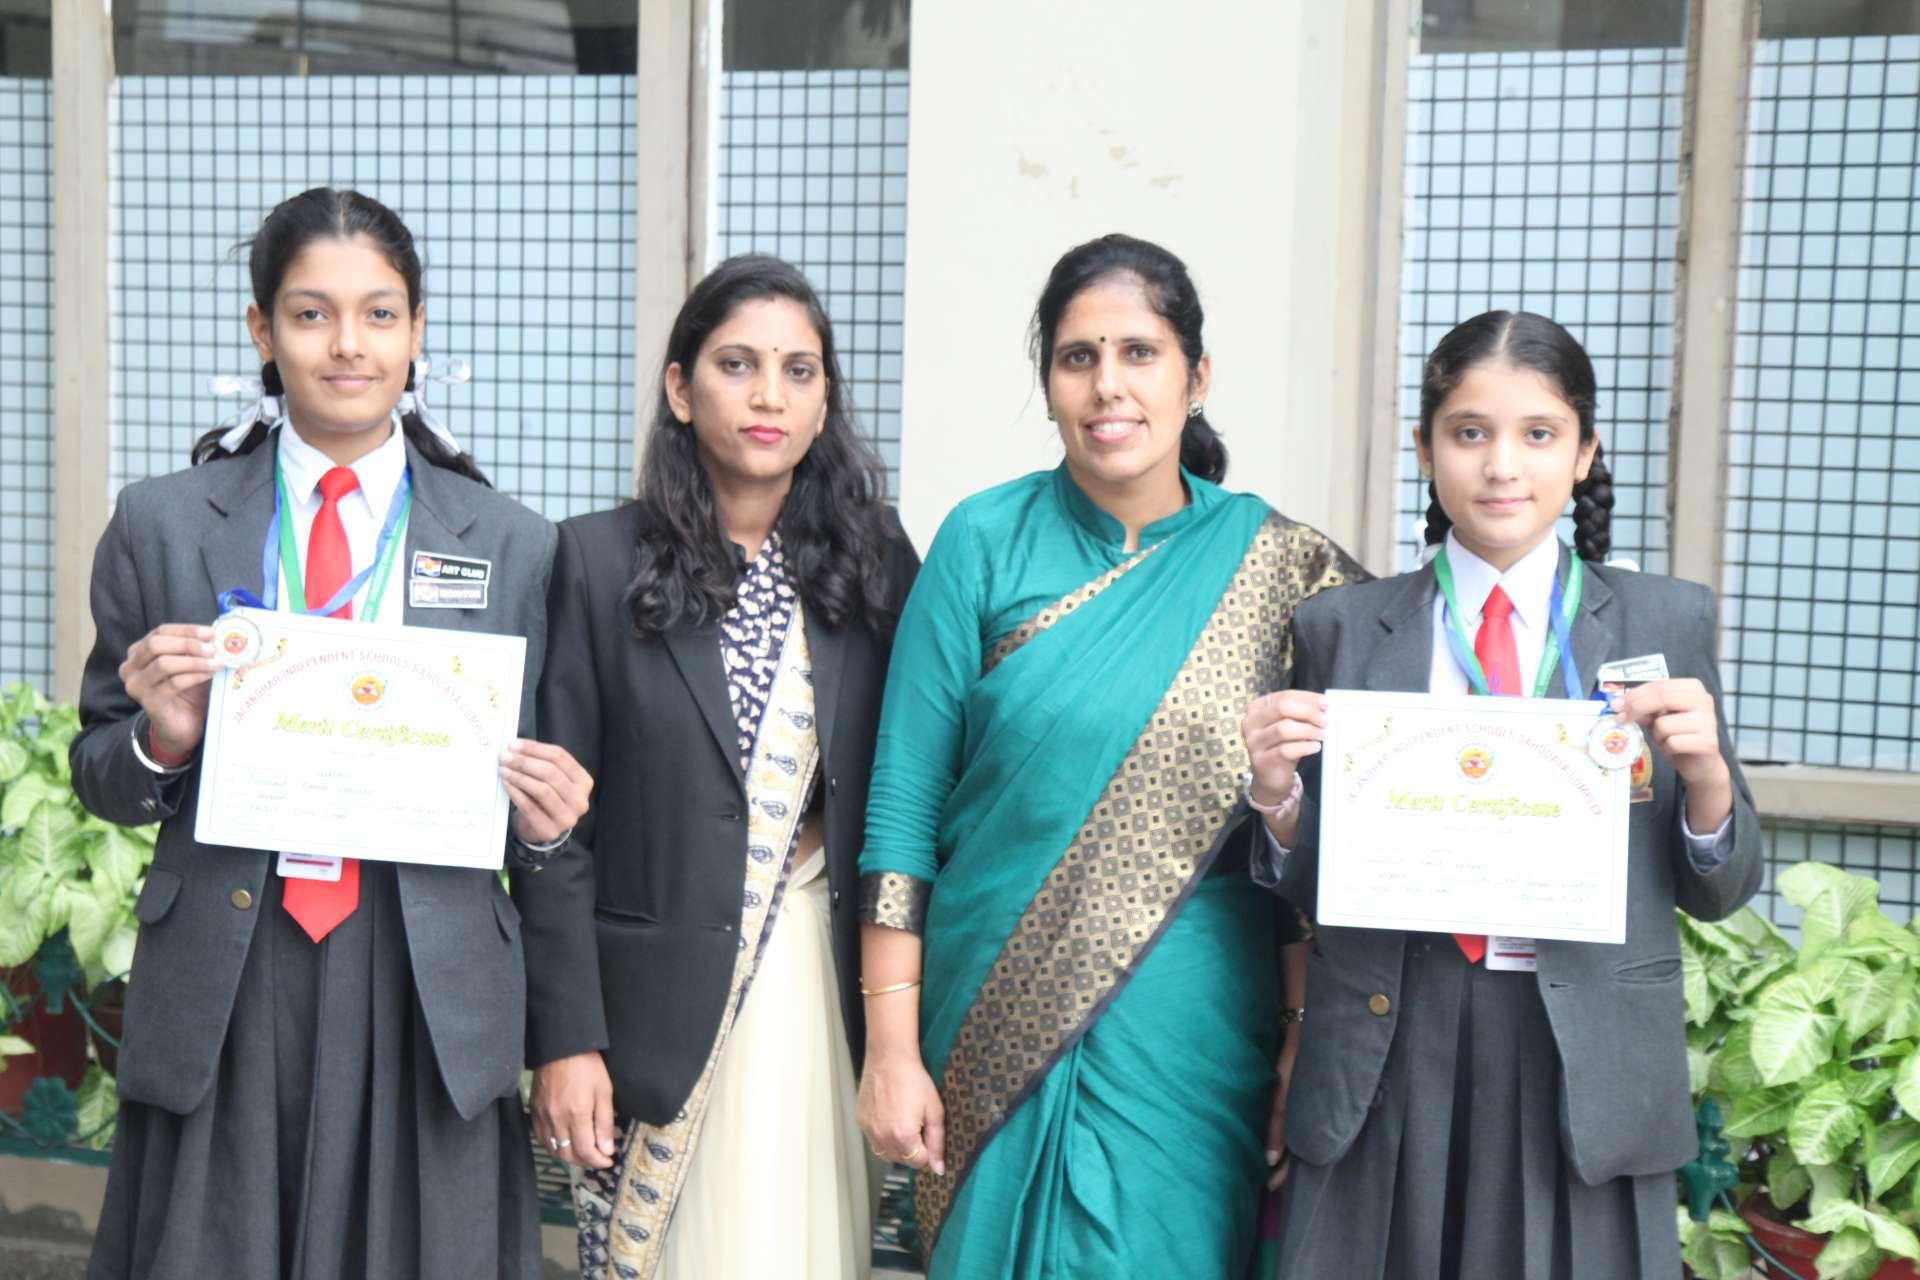 Innocentitesoutshone inSahodya Inter School Rangoli Competition